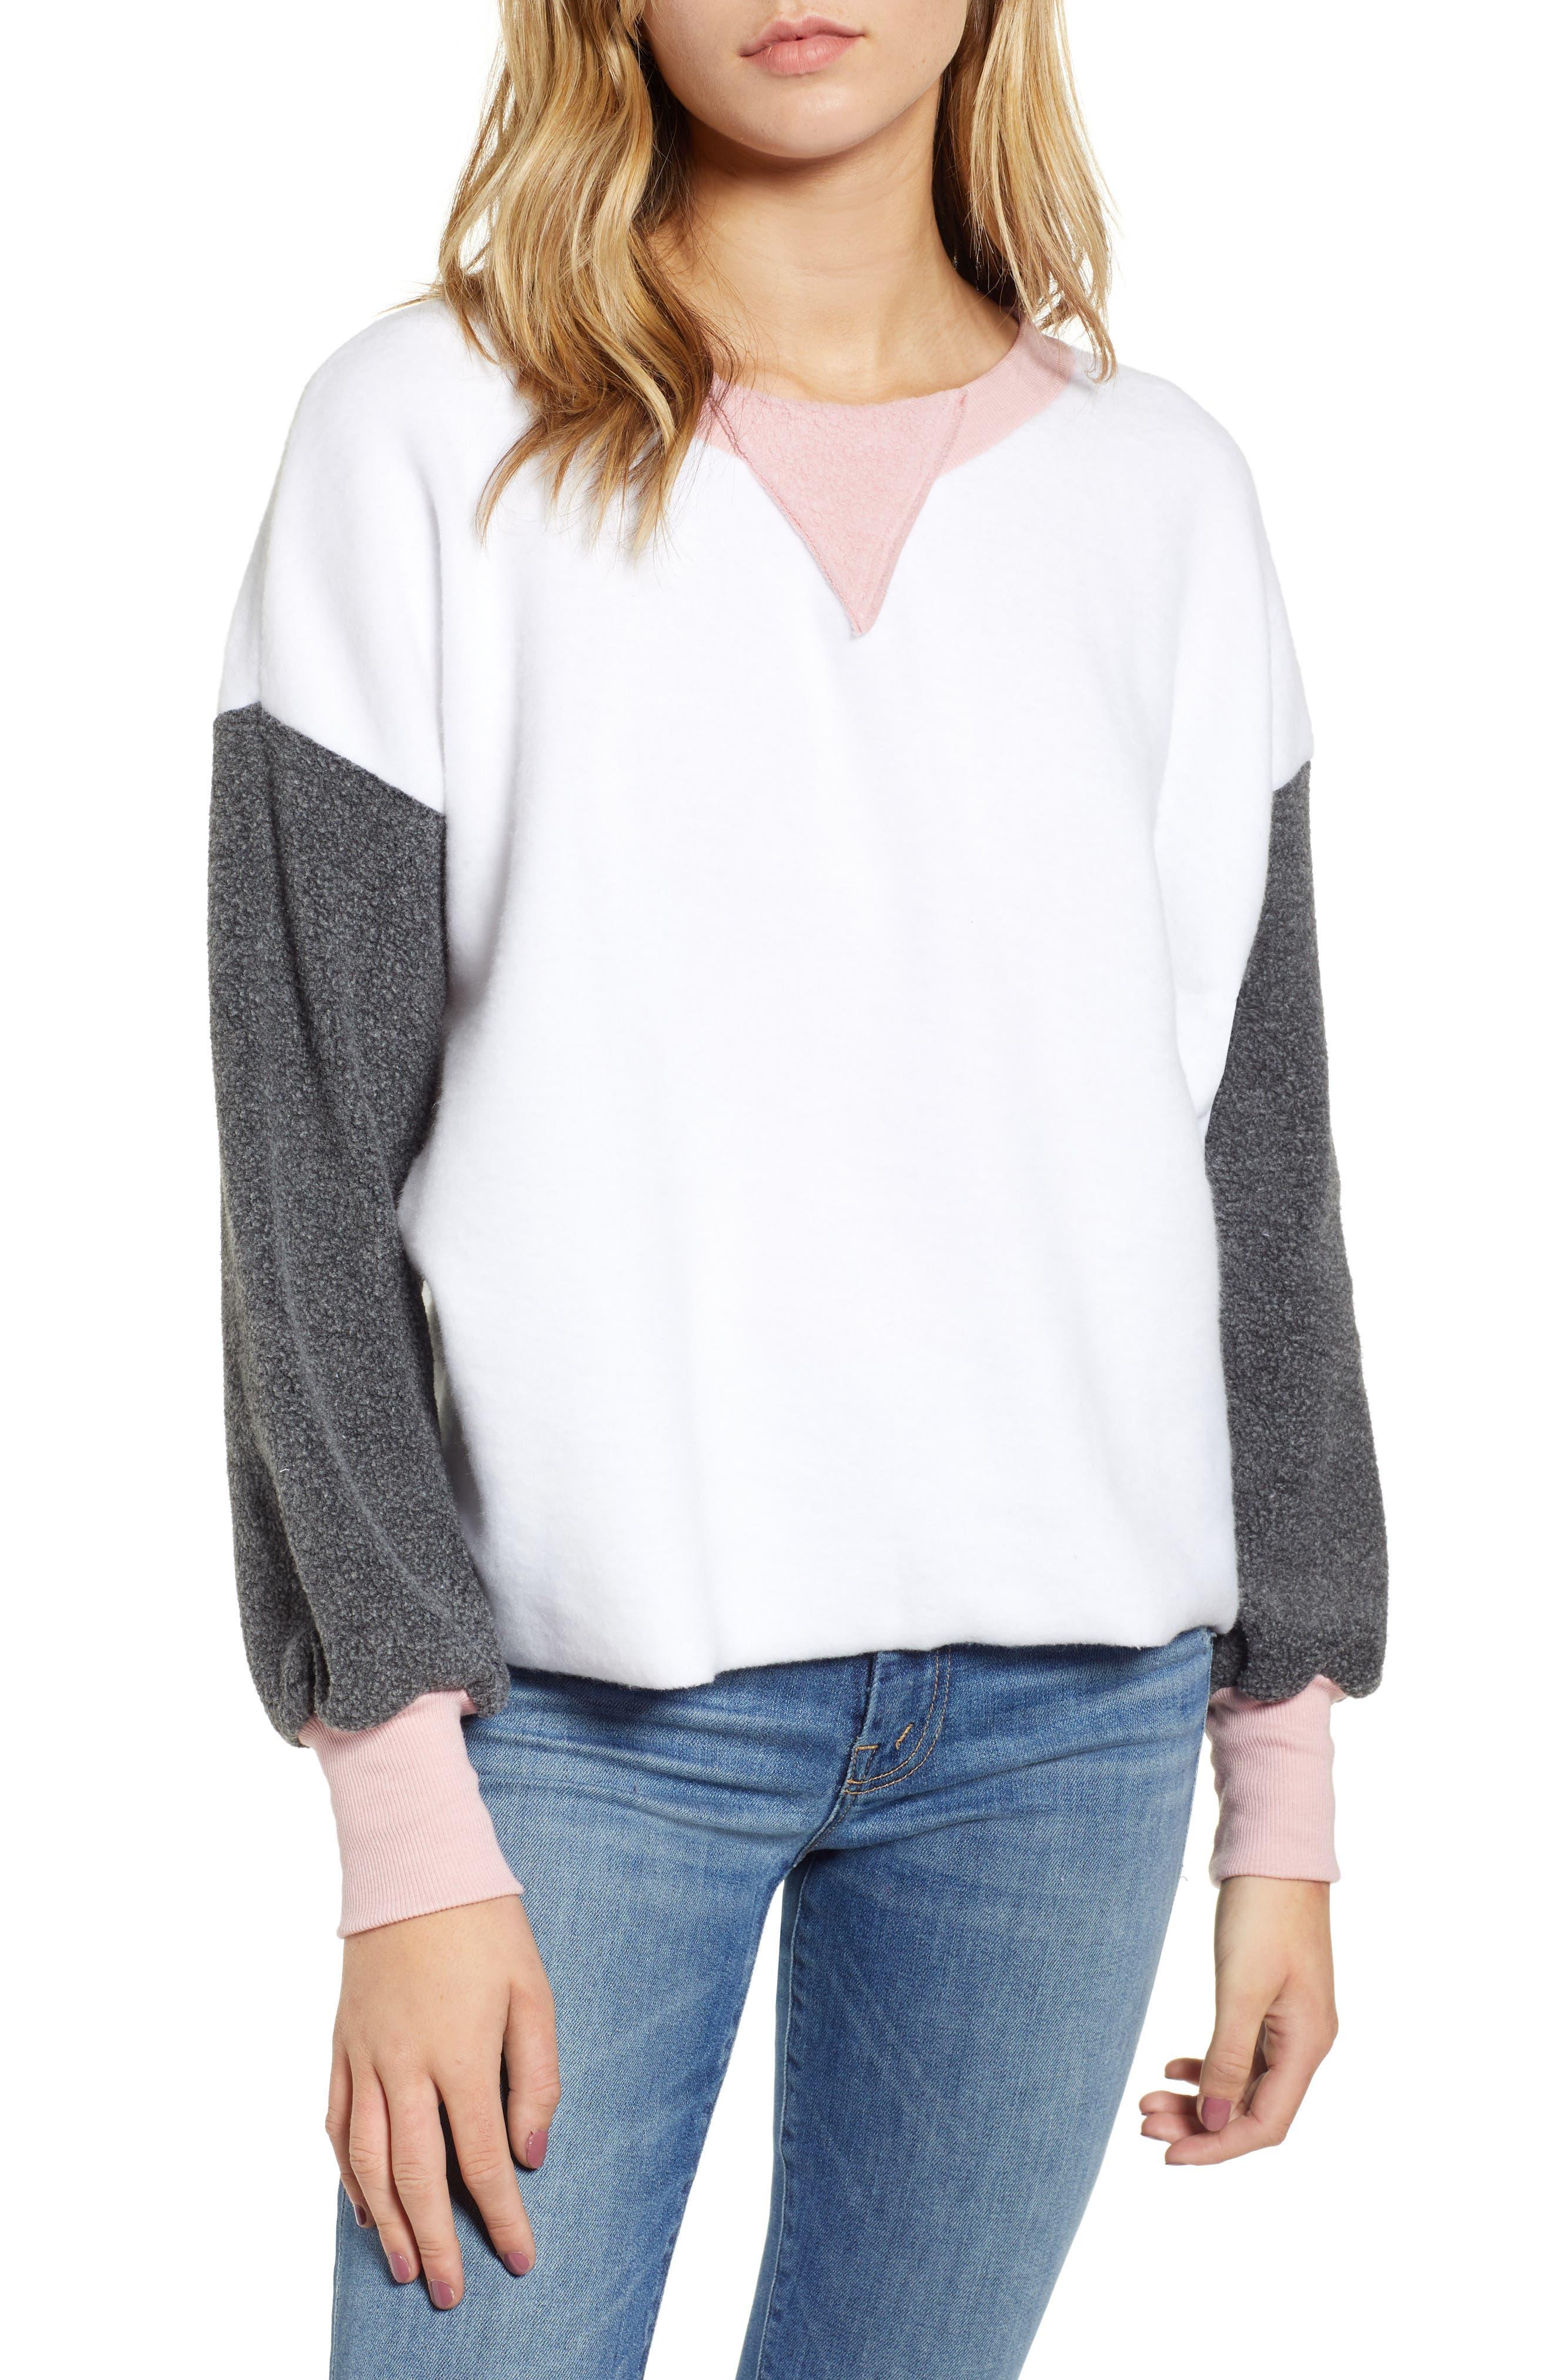 True Love Sweatshirt,                         Main,                         color, CLEAN WHITE MULTI